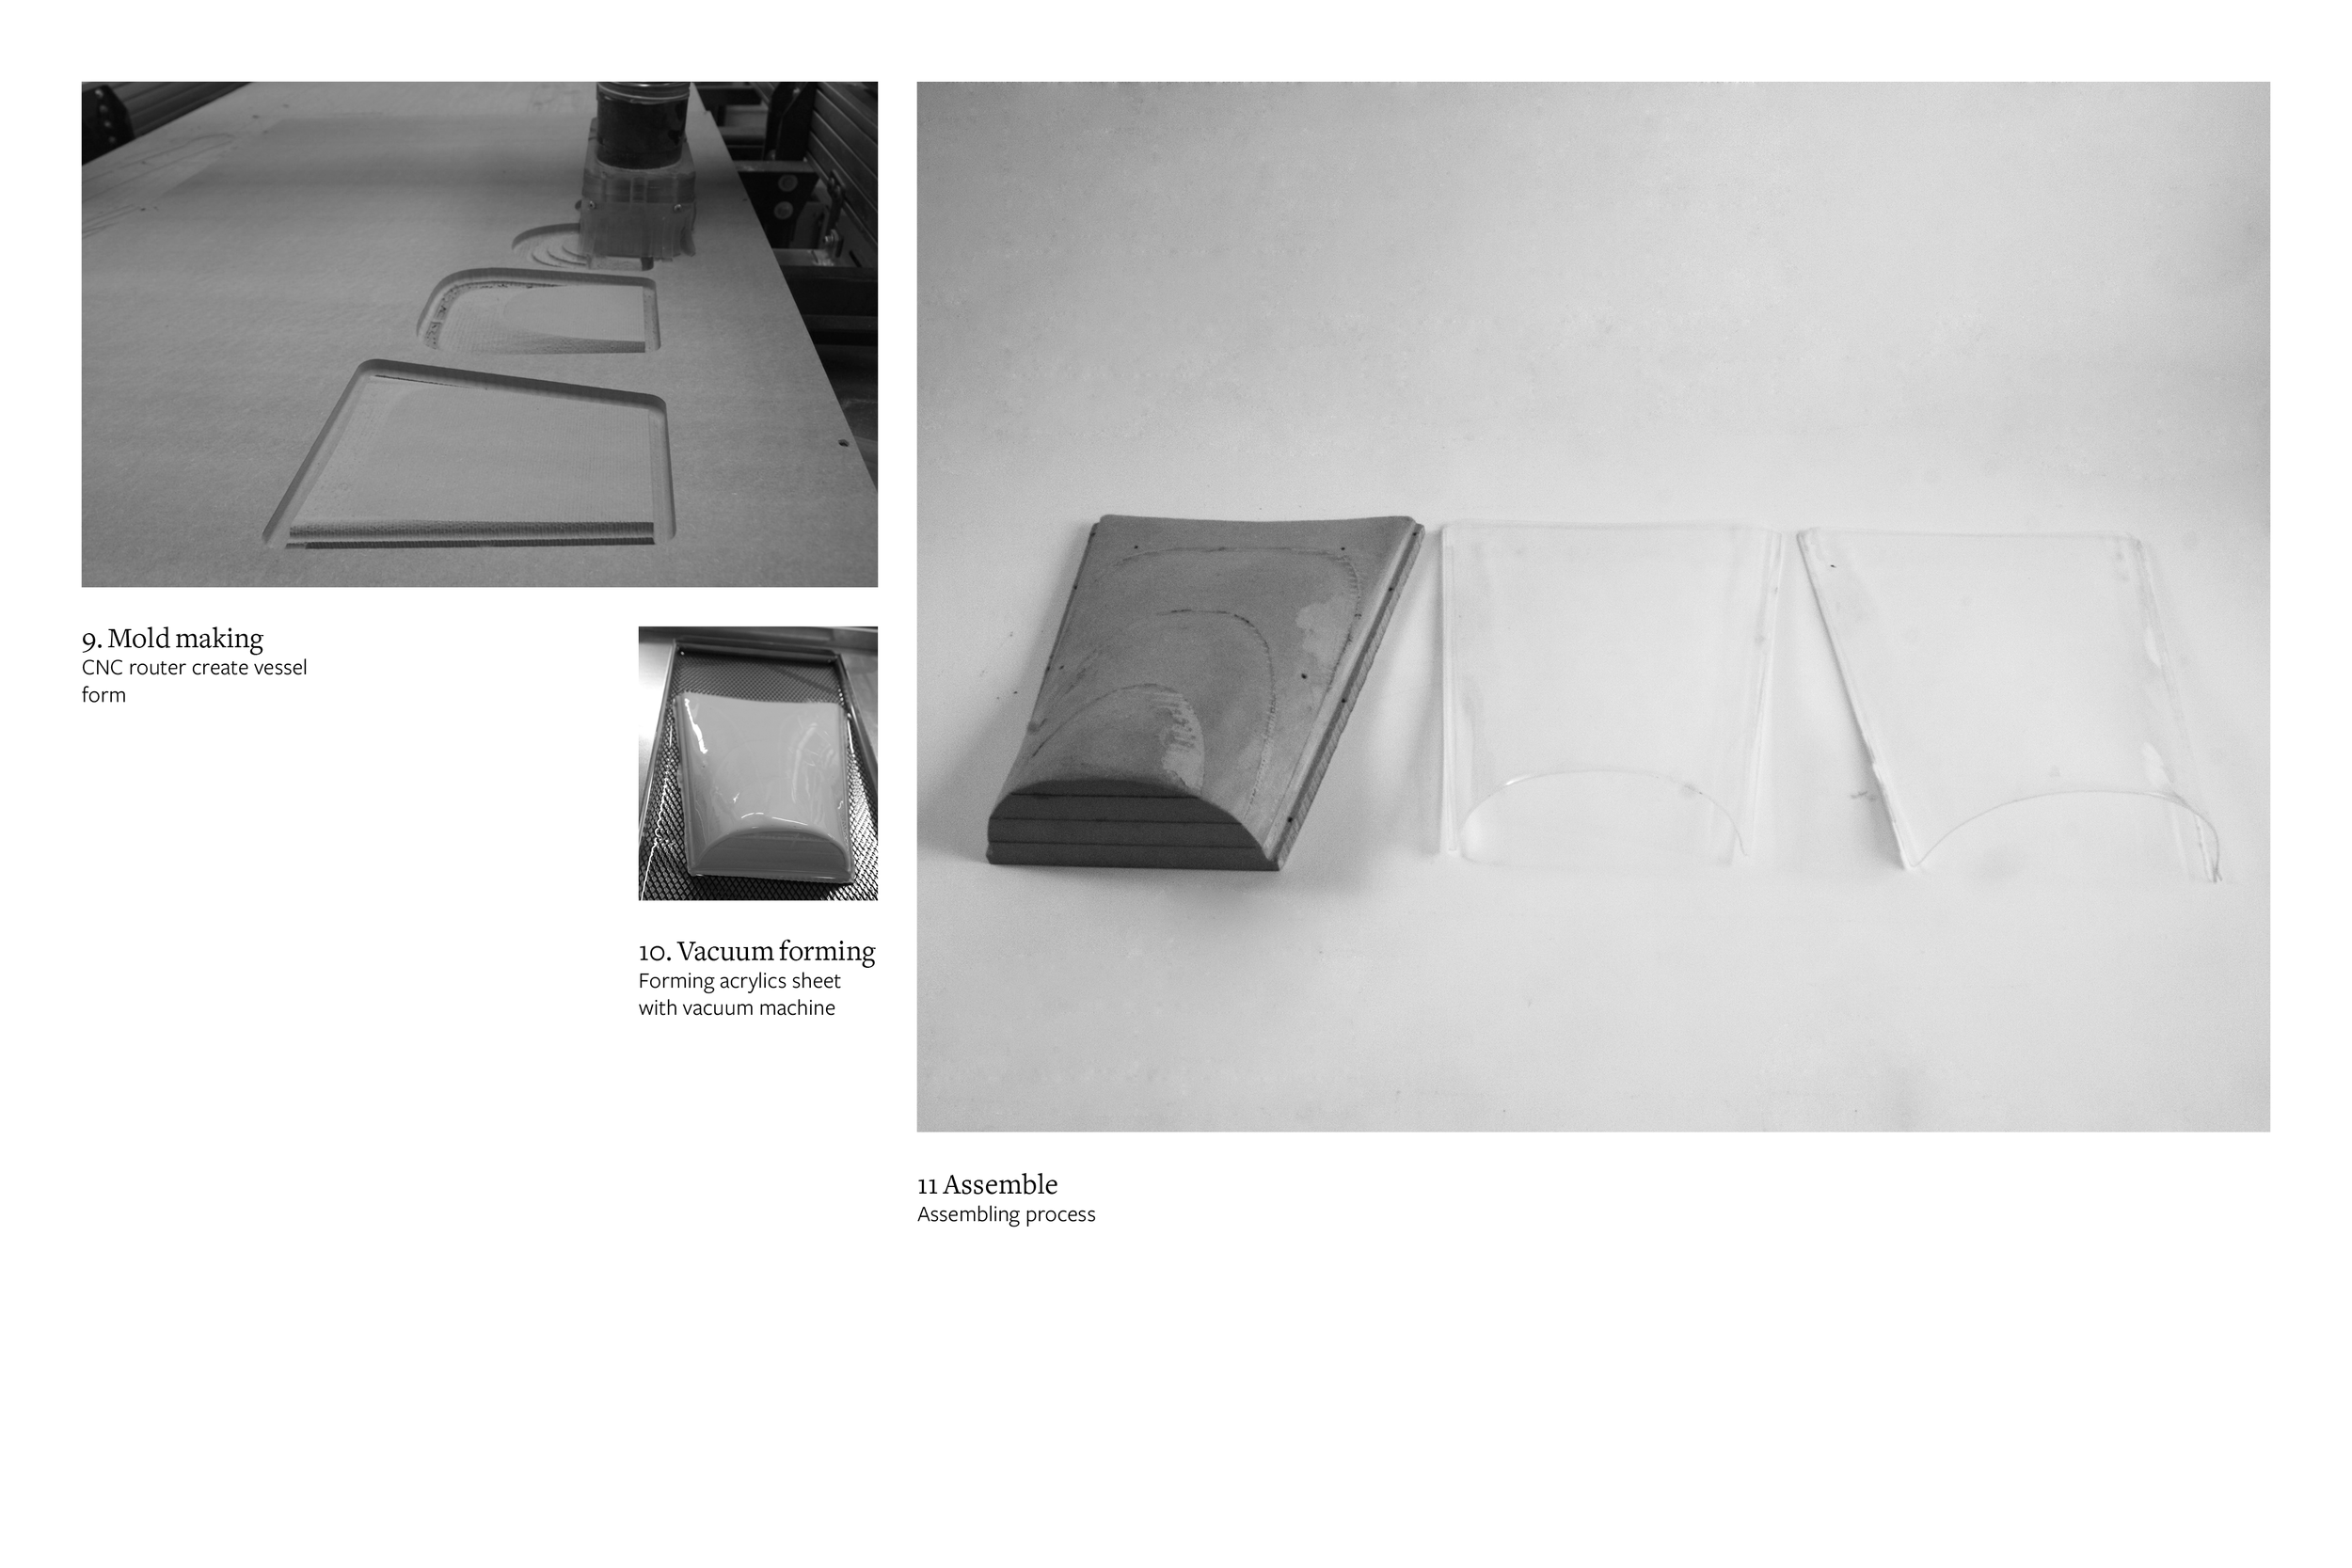 panisa-presentation-biovessel11.png